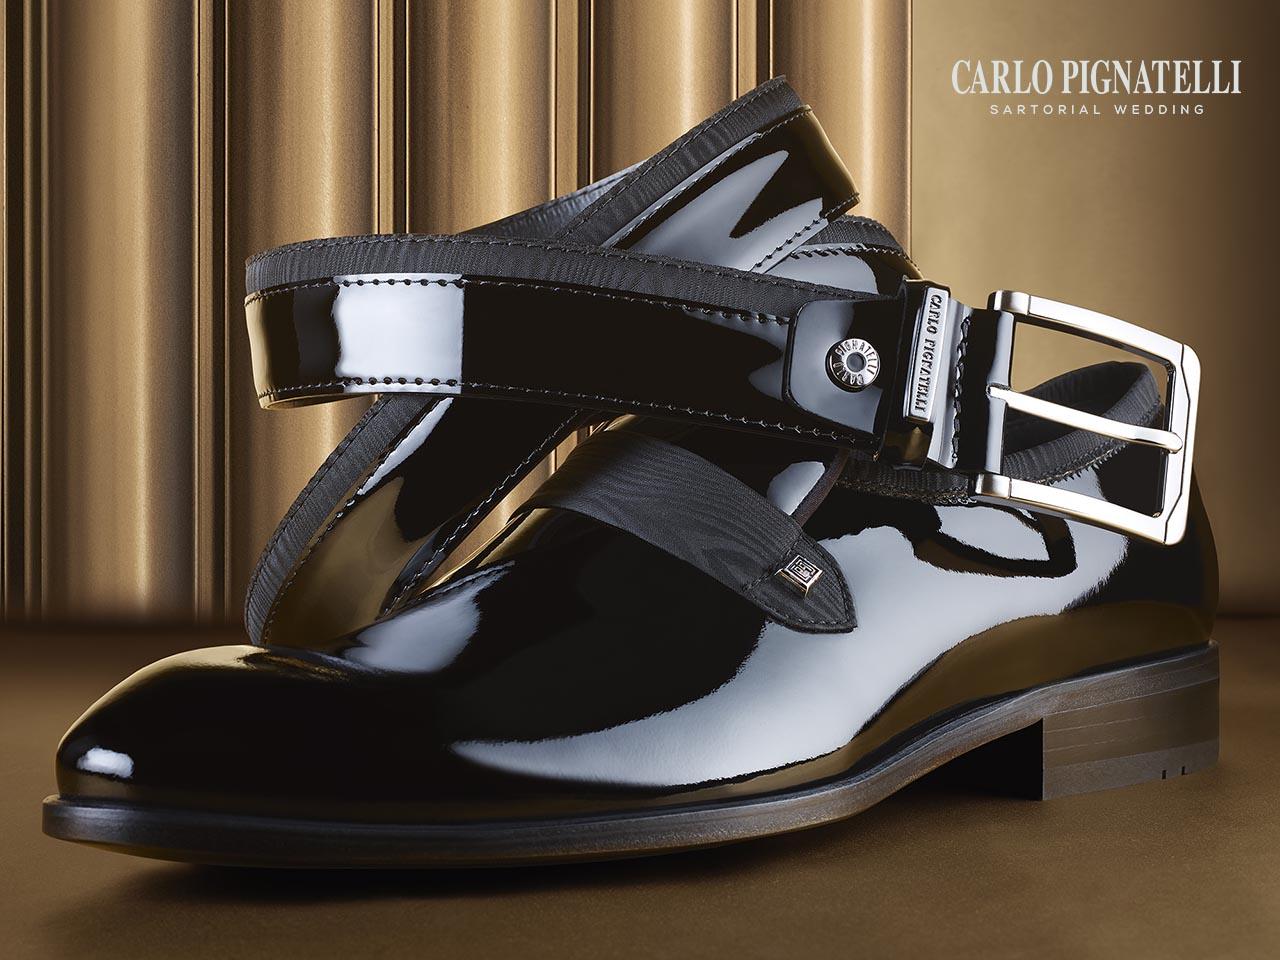 huge discount 1a988 69914 scarpe-carlo-pignatelli-accessori-2018 (1) - Ricci Sposo